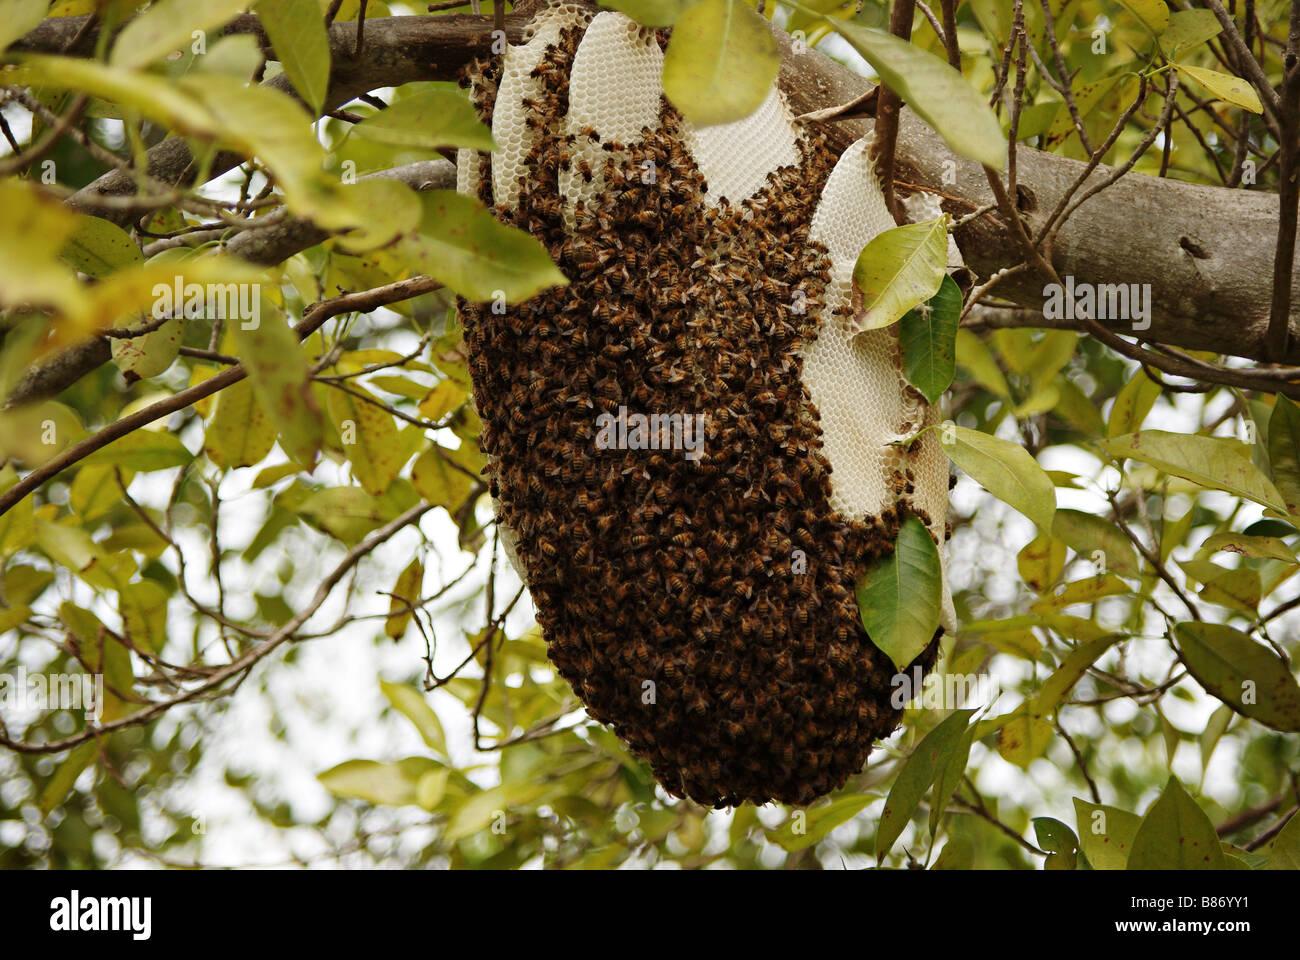 wild bees stockfotos wild bees bilder alamy. Black Bedroom Furniture Sets. Home Design Ideas